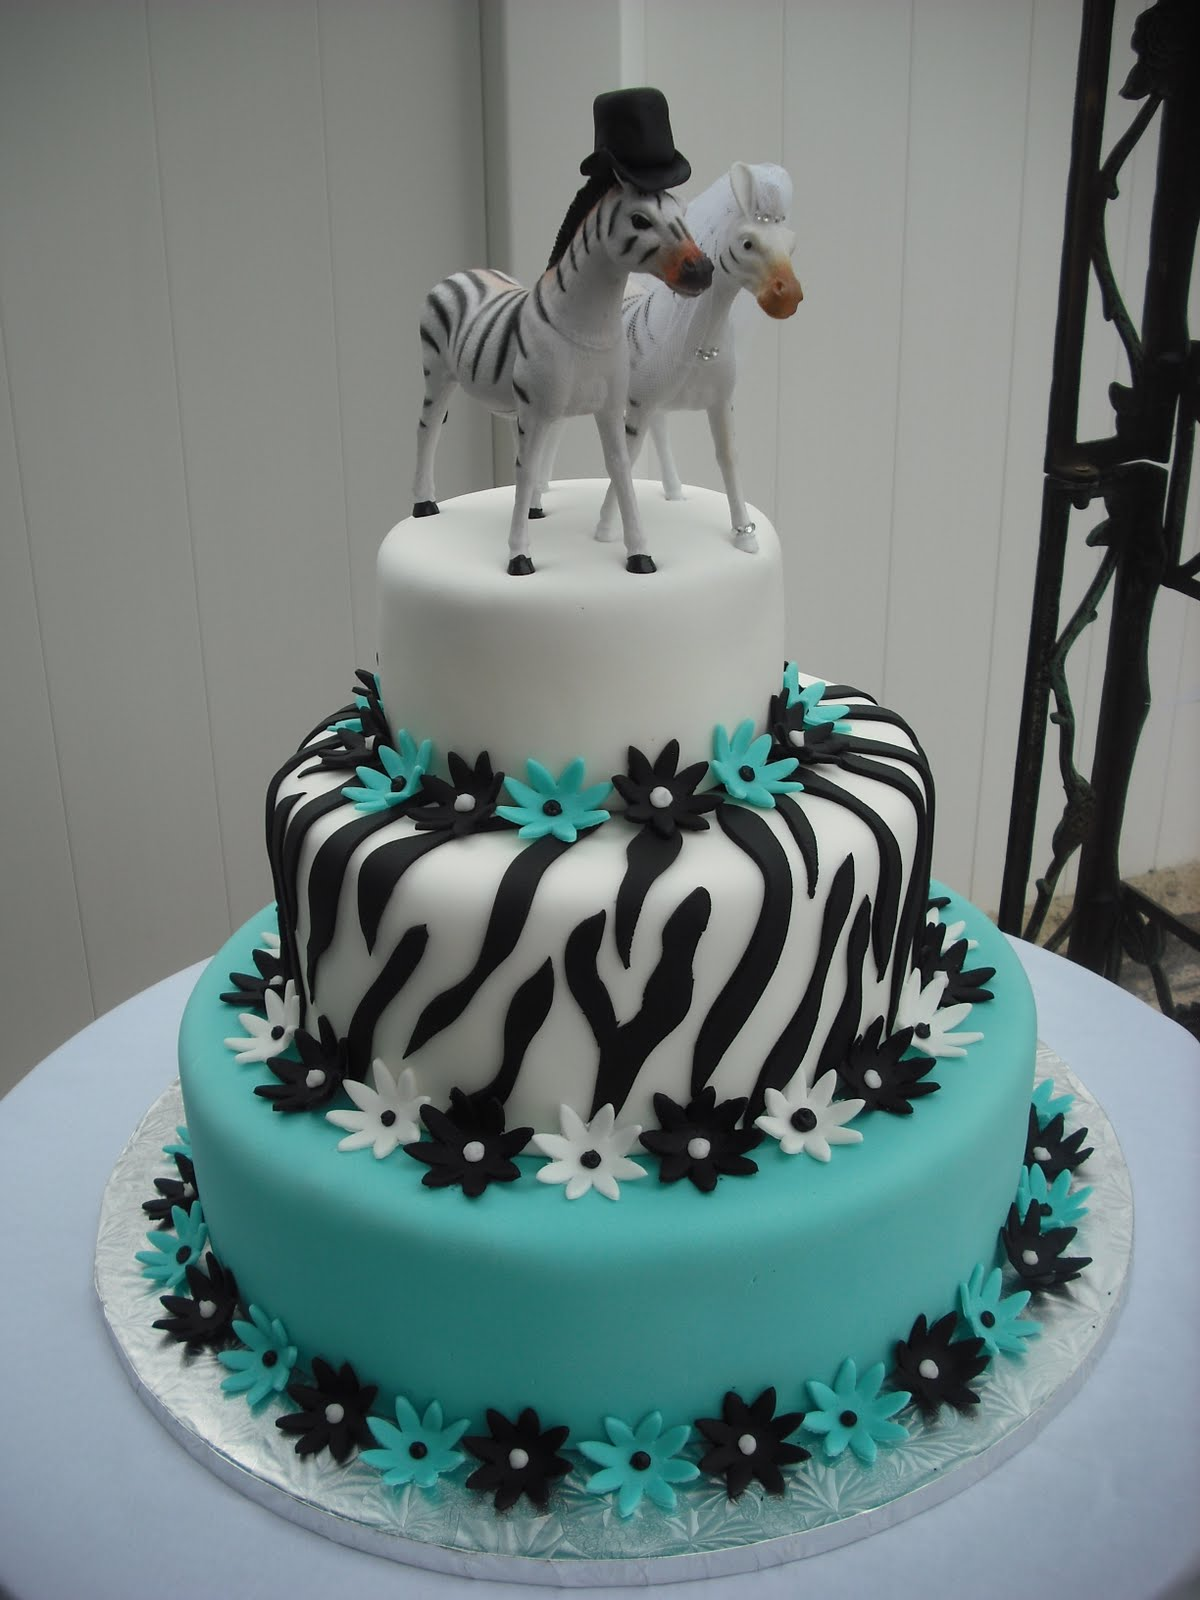 Swell 6 2014 Cheetah And Zebra Print Cakes Photo Hello Kitty Cheetah Funny Birthday Cards Online Alyptdamsfinfo